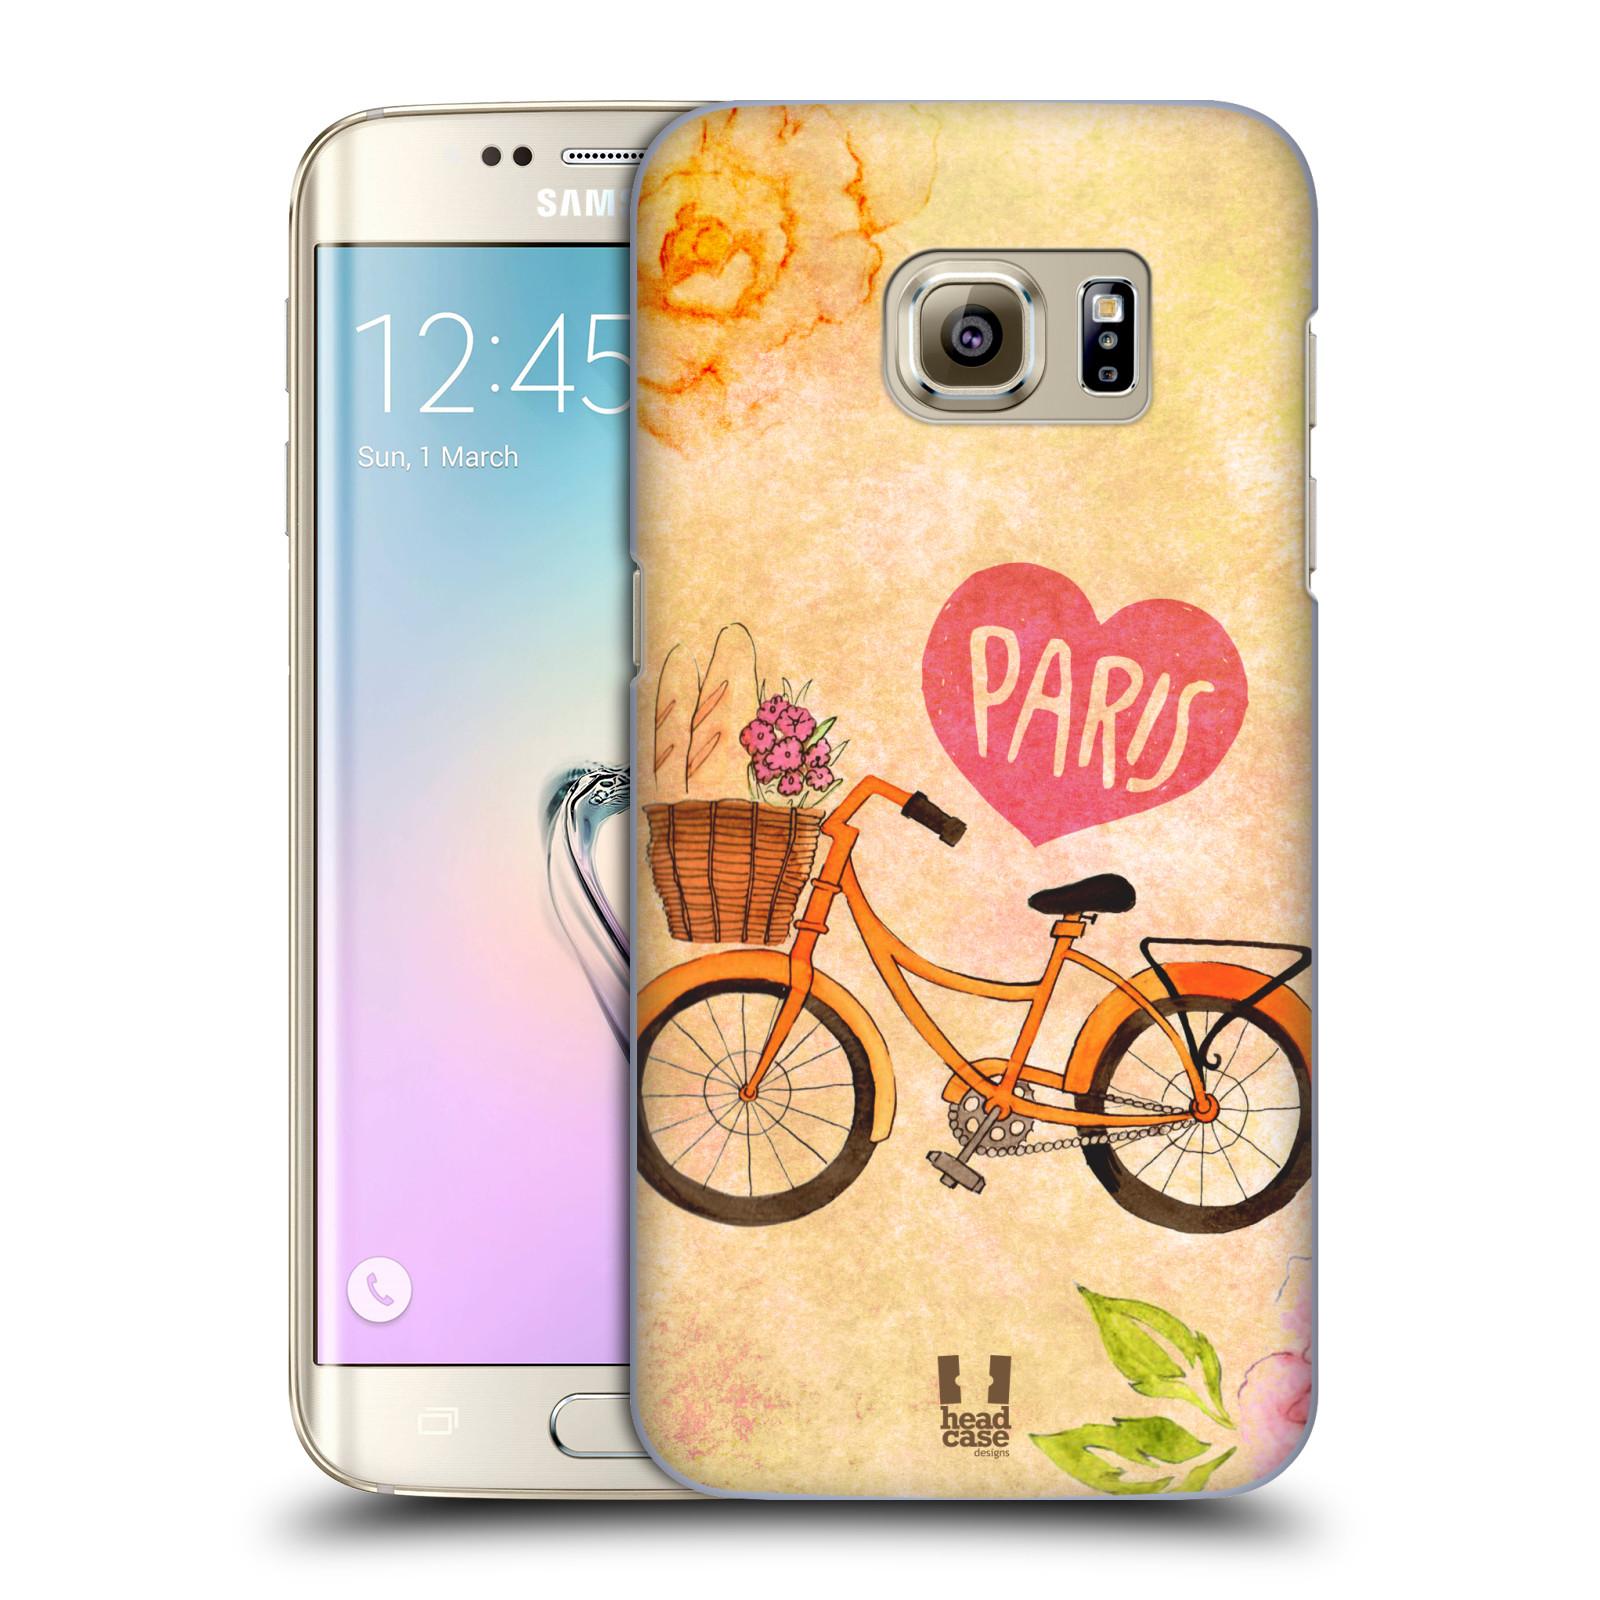 Plastové pouzdro na mobil Samsung Galaxy S7 Edge HEAD CASE PAŘÍŽ NA KOLE (Kryt či obal na mobilní telefon Samsung Galaxy S7 Edge SM-G935F)